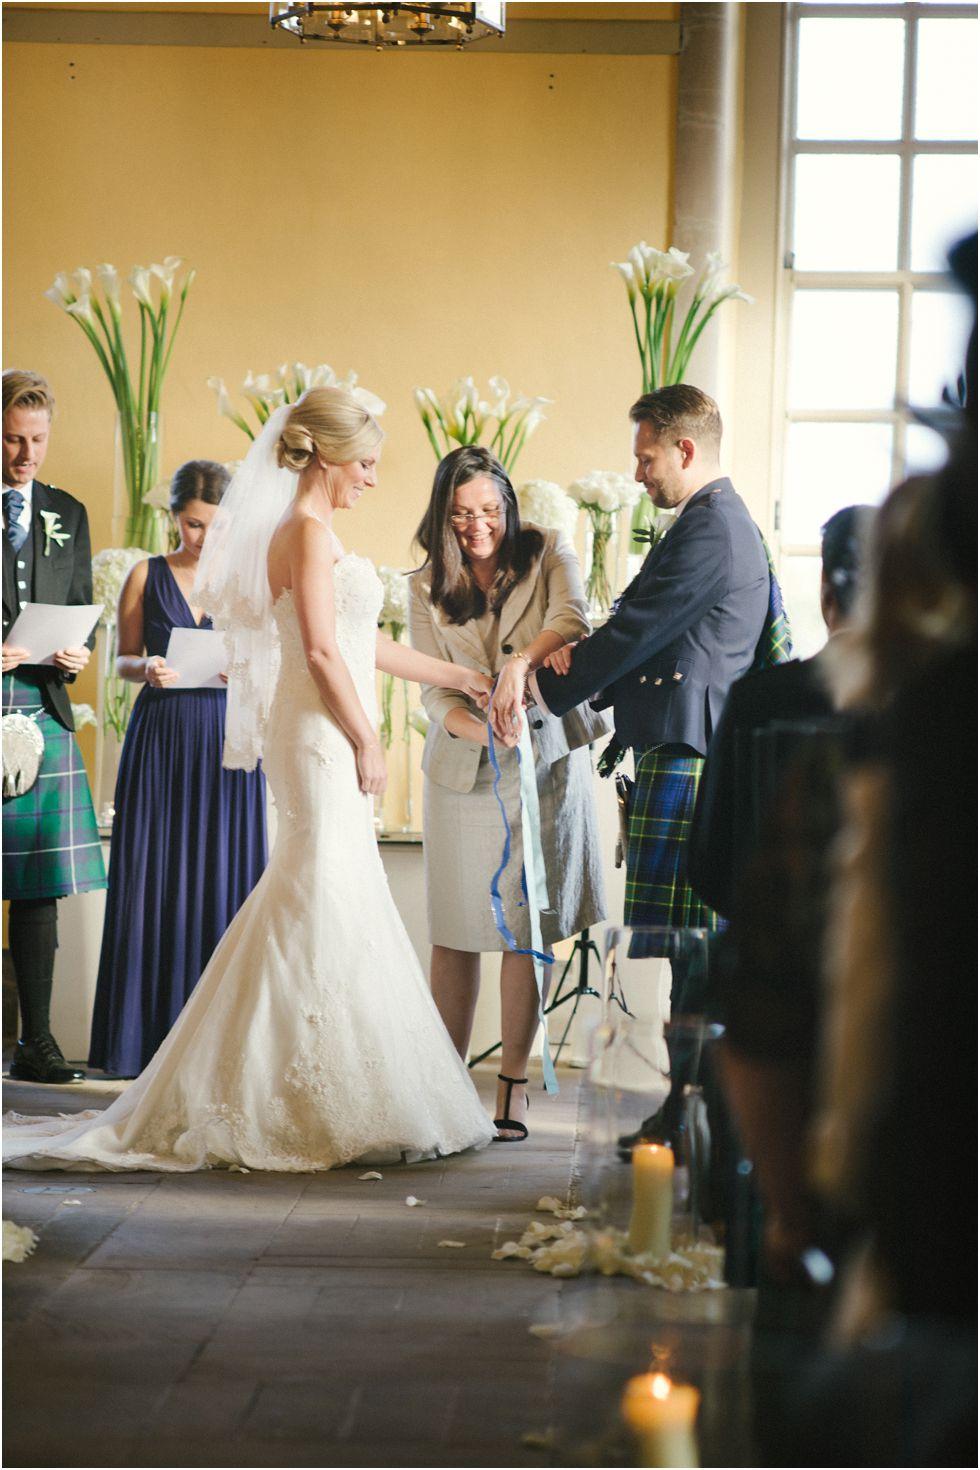 Hopetoun-House-wedding-photography-Edinburgh-34.jpg